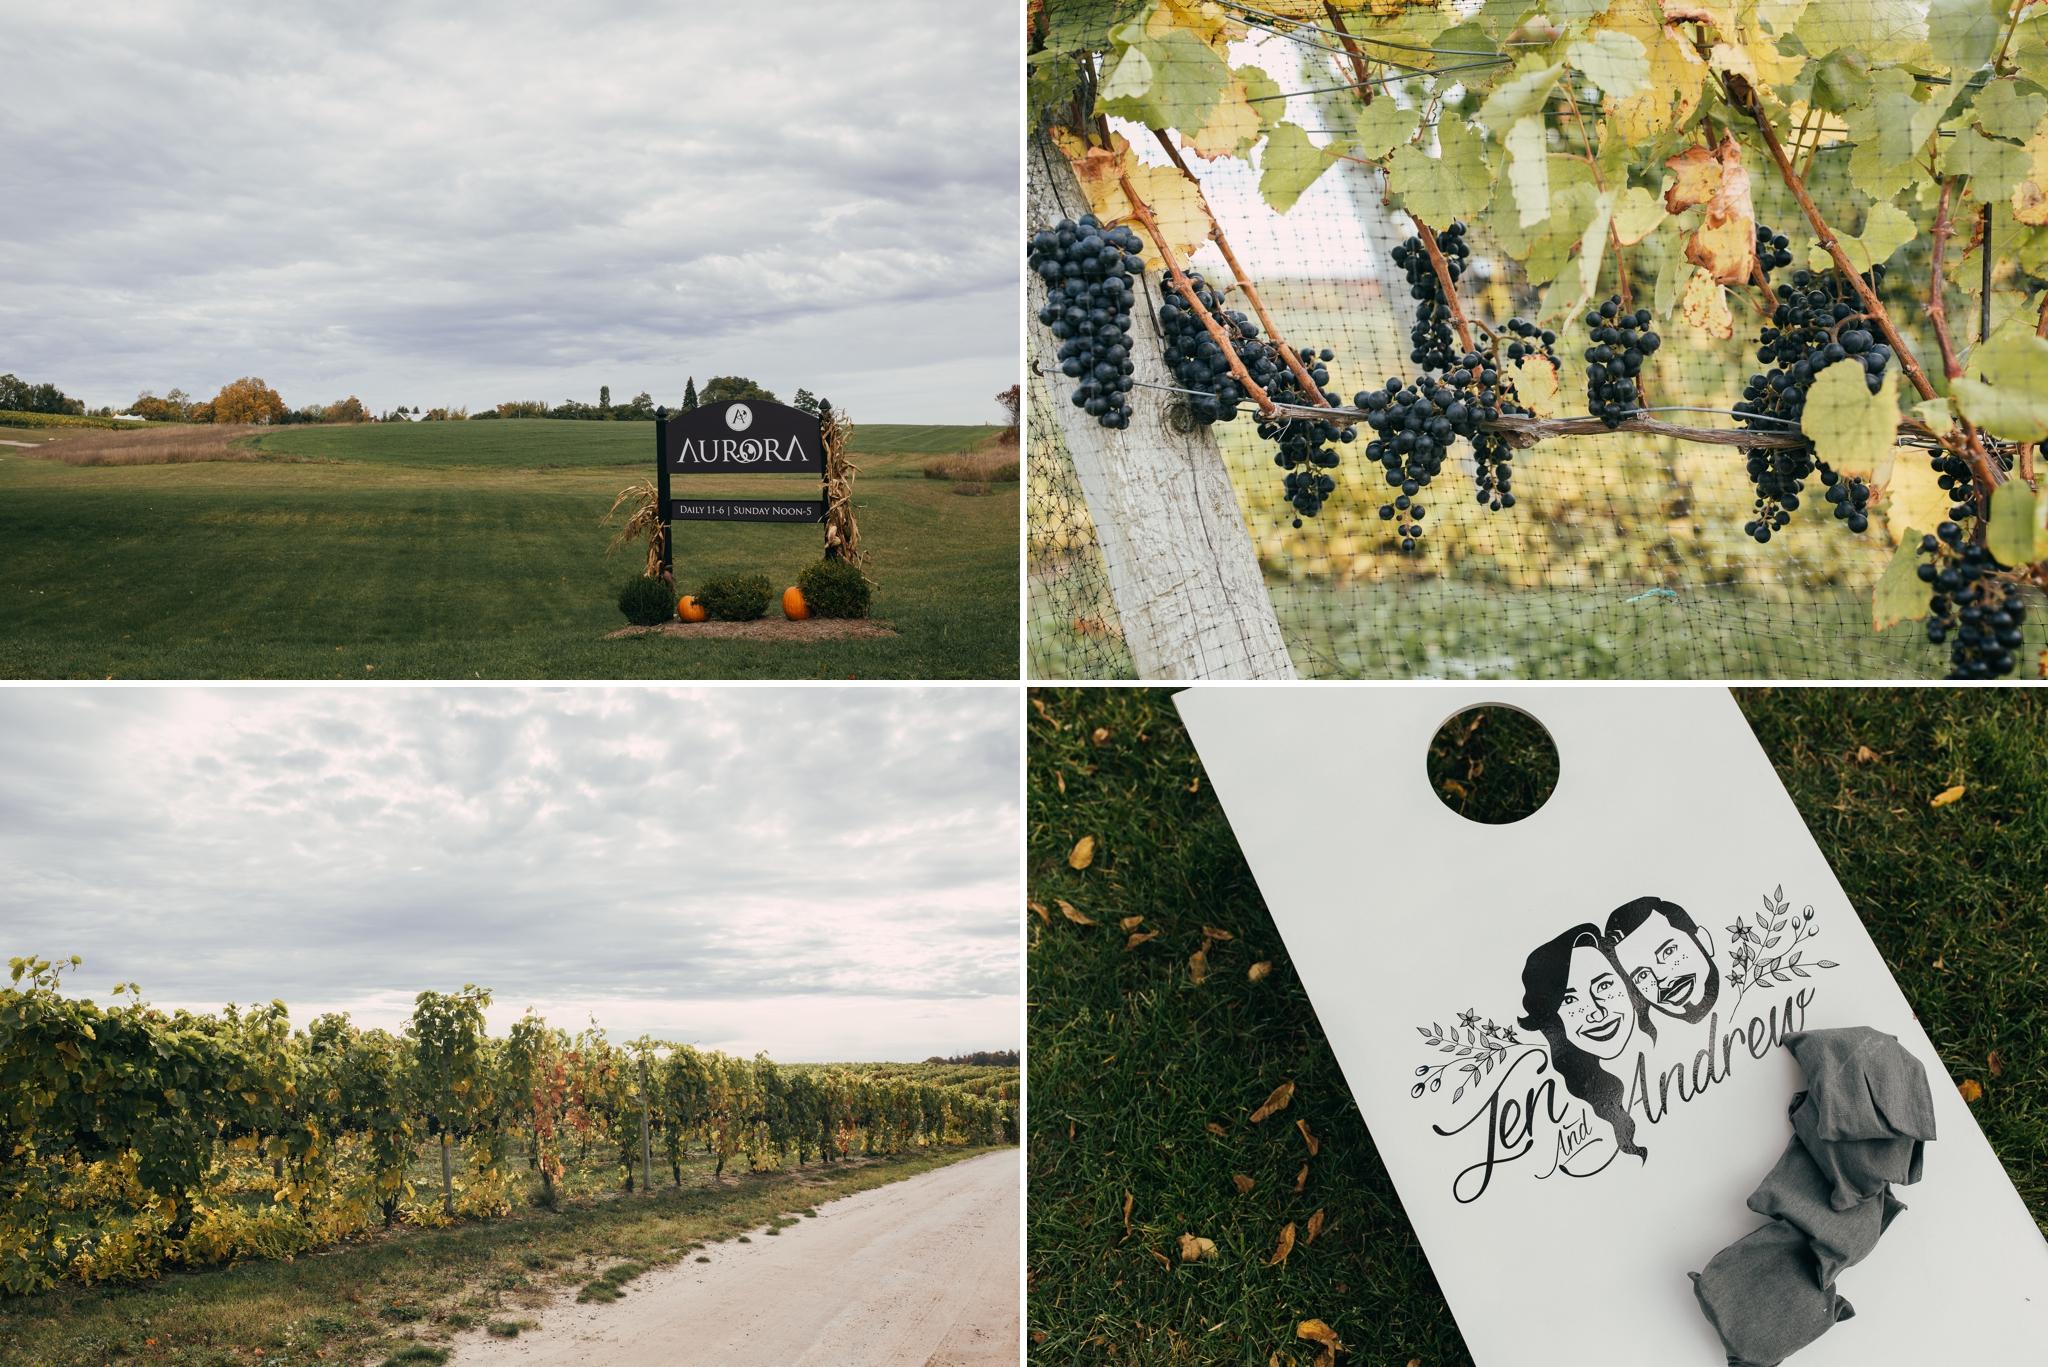 Heather-Nash-Photography-Aurora-Cellars-Wedding-Leelanau-Peninsula-Michigan_0090.jpg